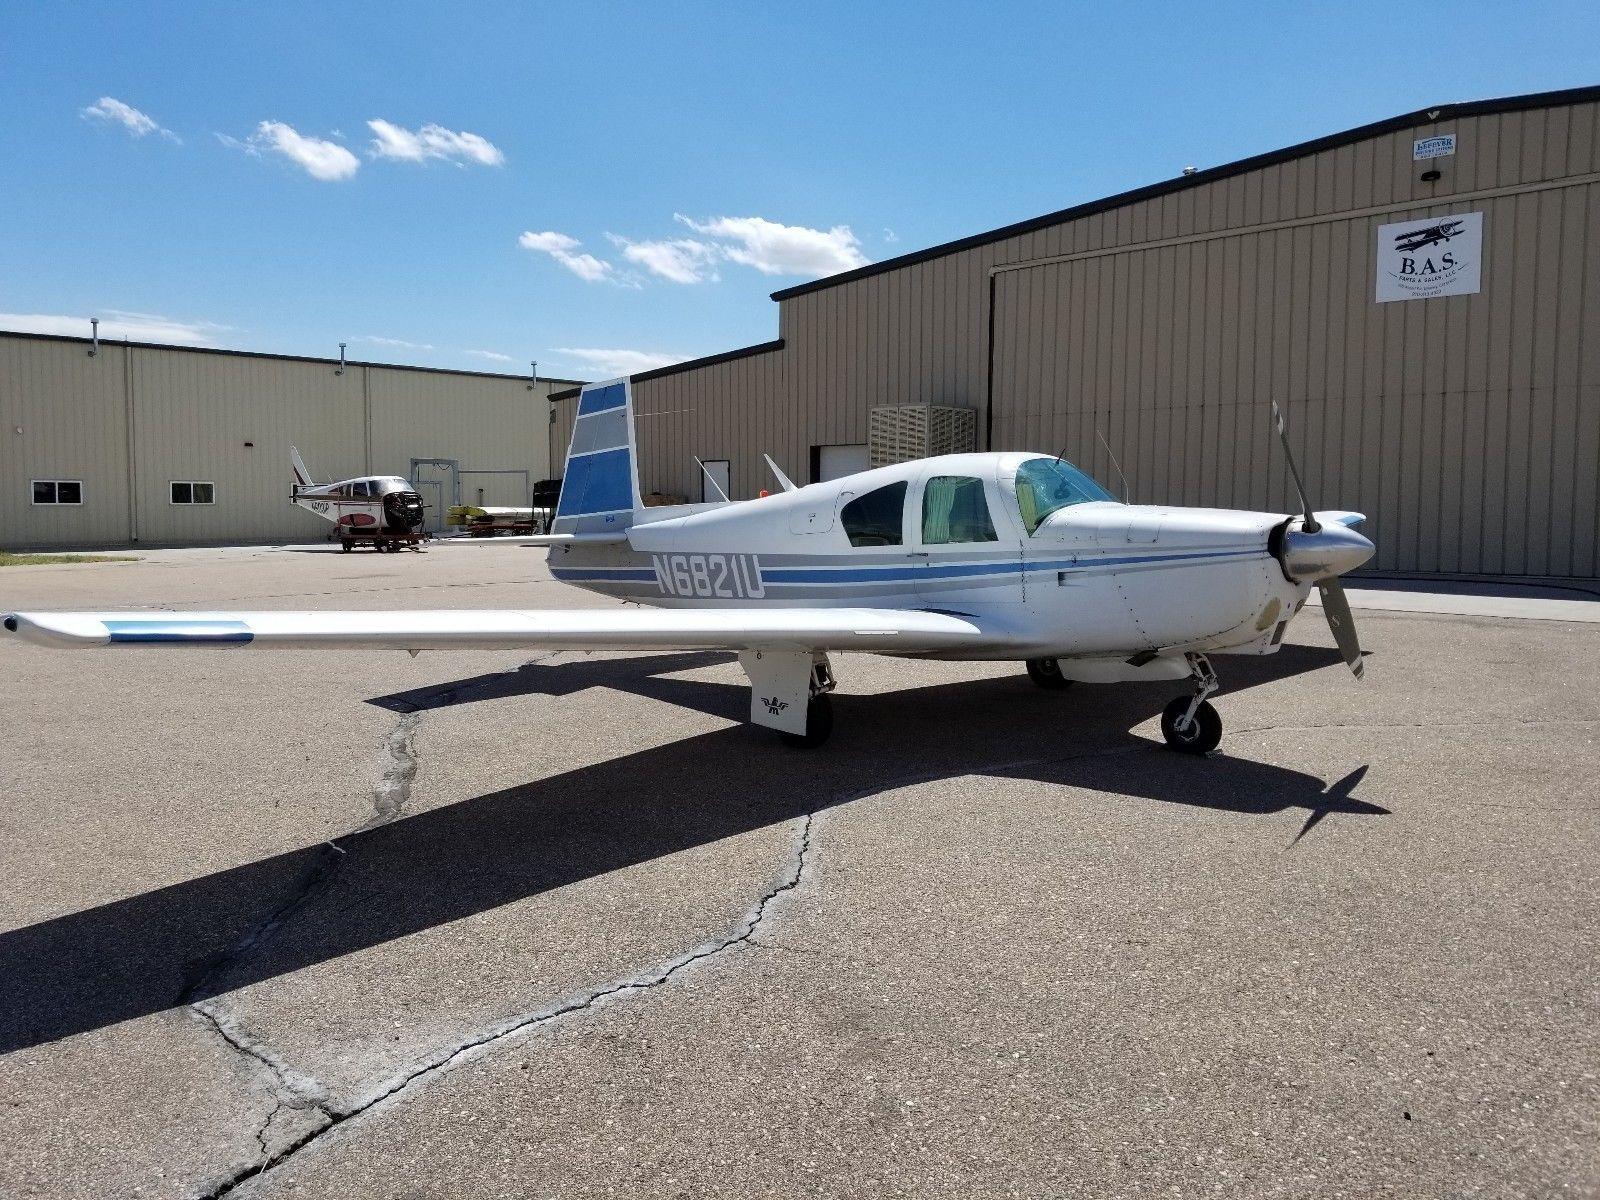 överhauled 1963 Mooney M20C aircraft for sale